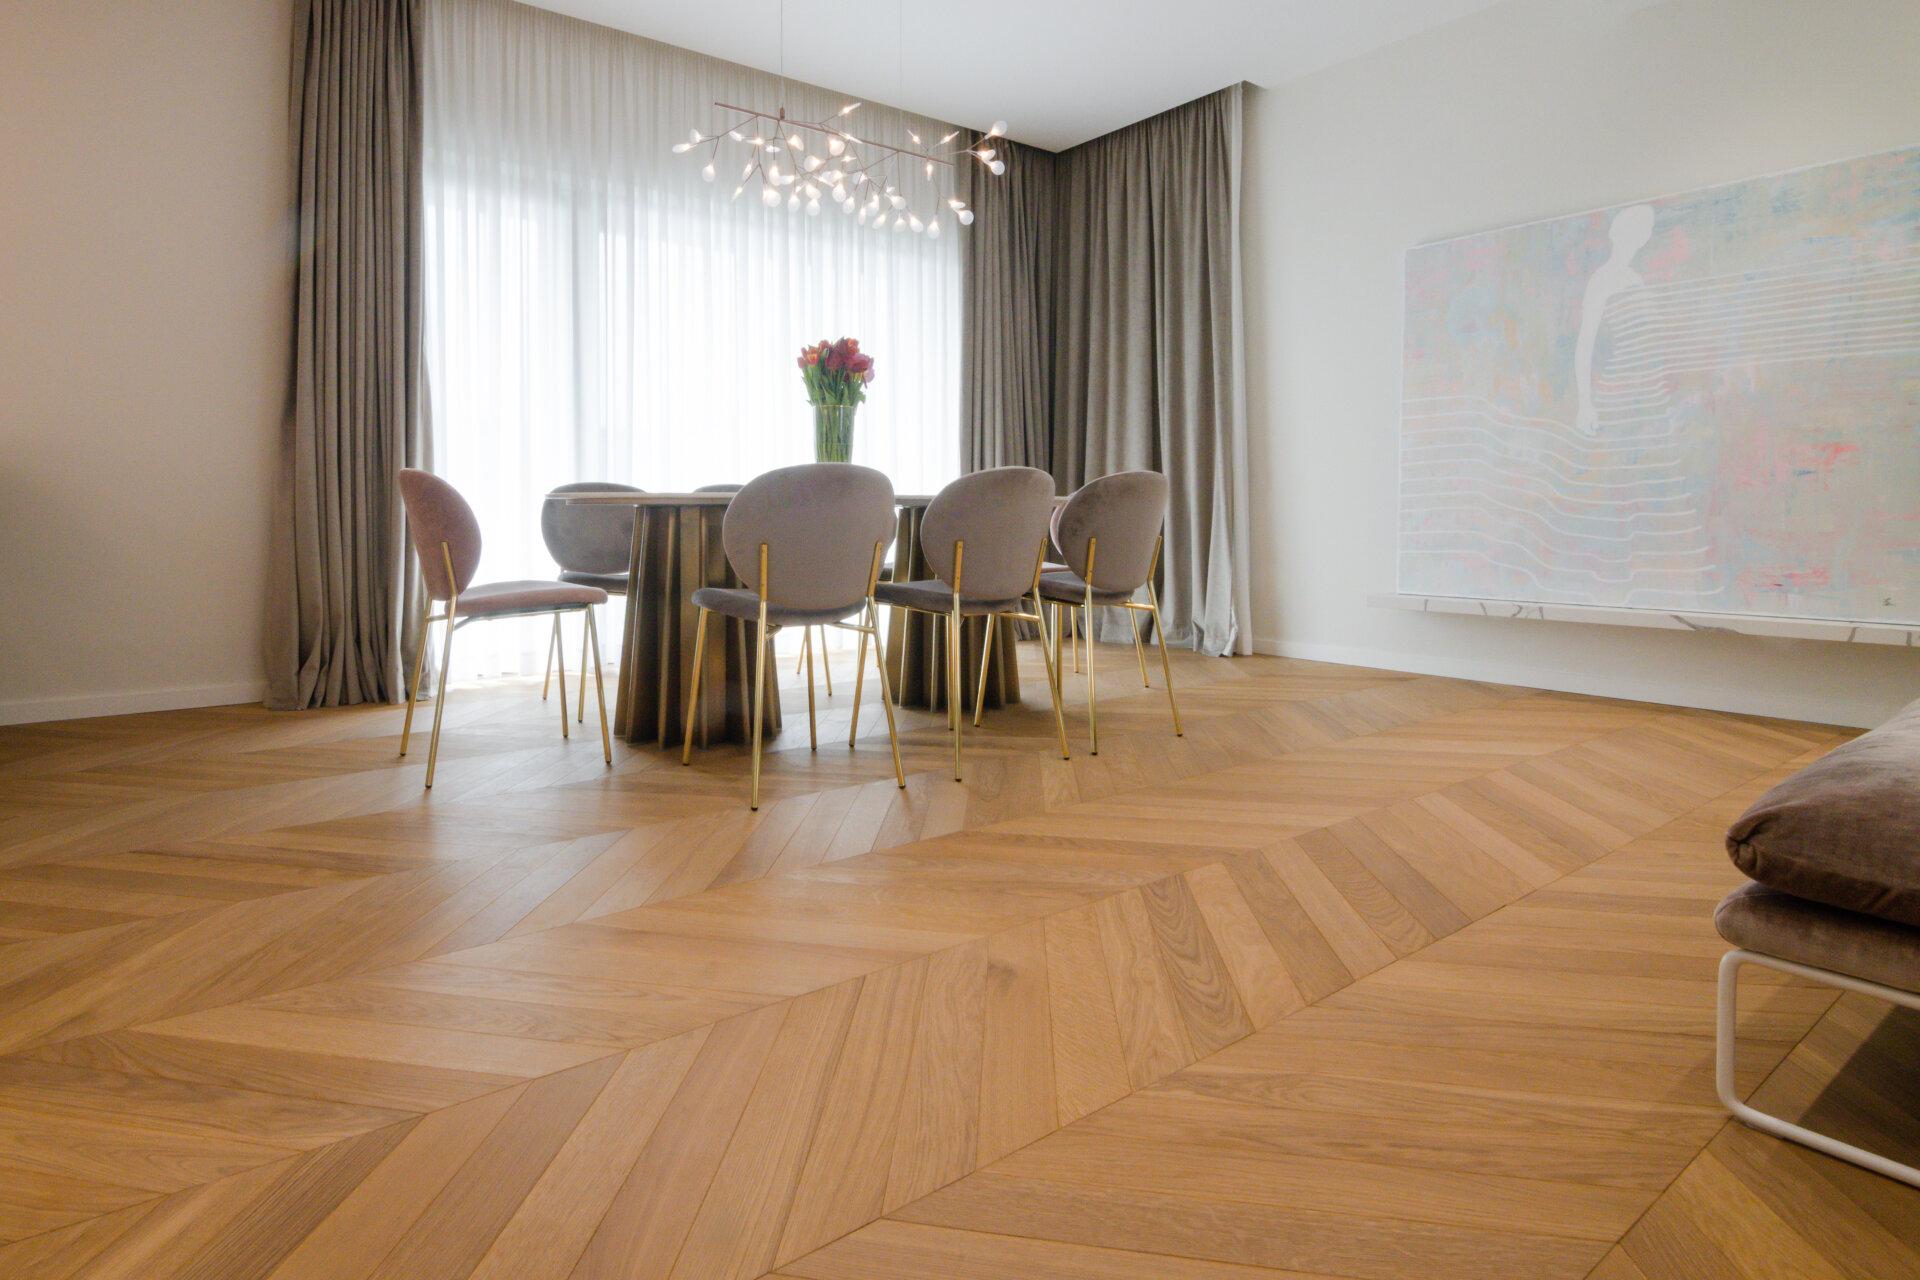 20210303-carpet&more-vila-bogdan-craiova-by-hugmedia-04